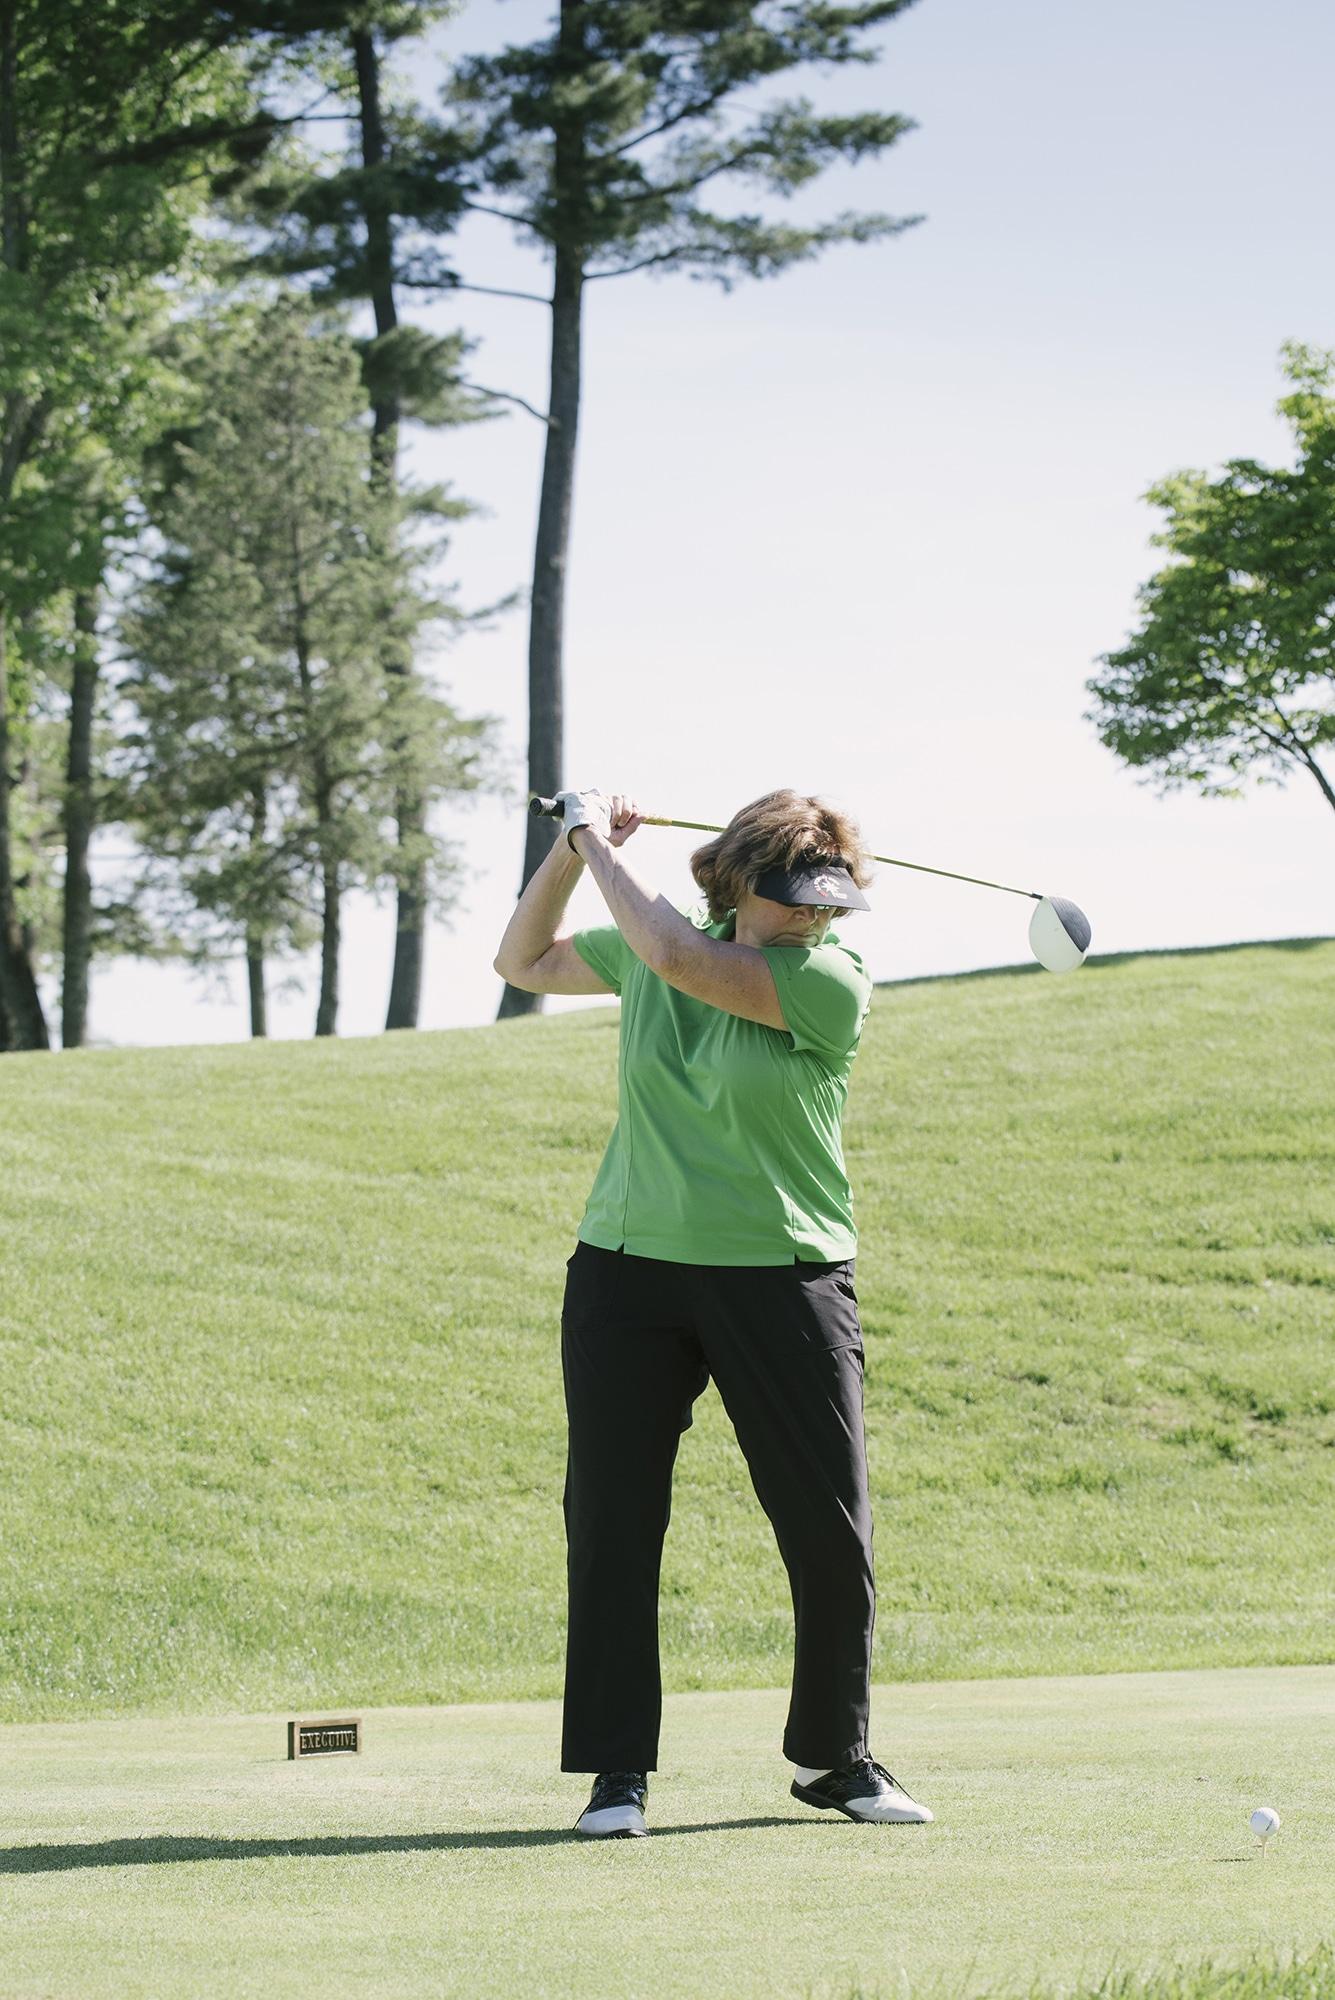 Community Options, Inc. iMatter Spring Golf Classic on Monday, May 21, 2018 at TPC Jasna Polana in Princeton, NJ.